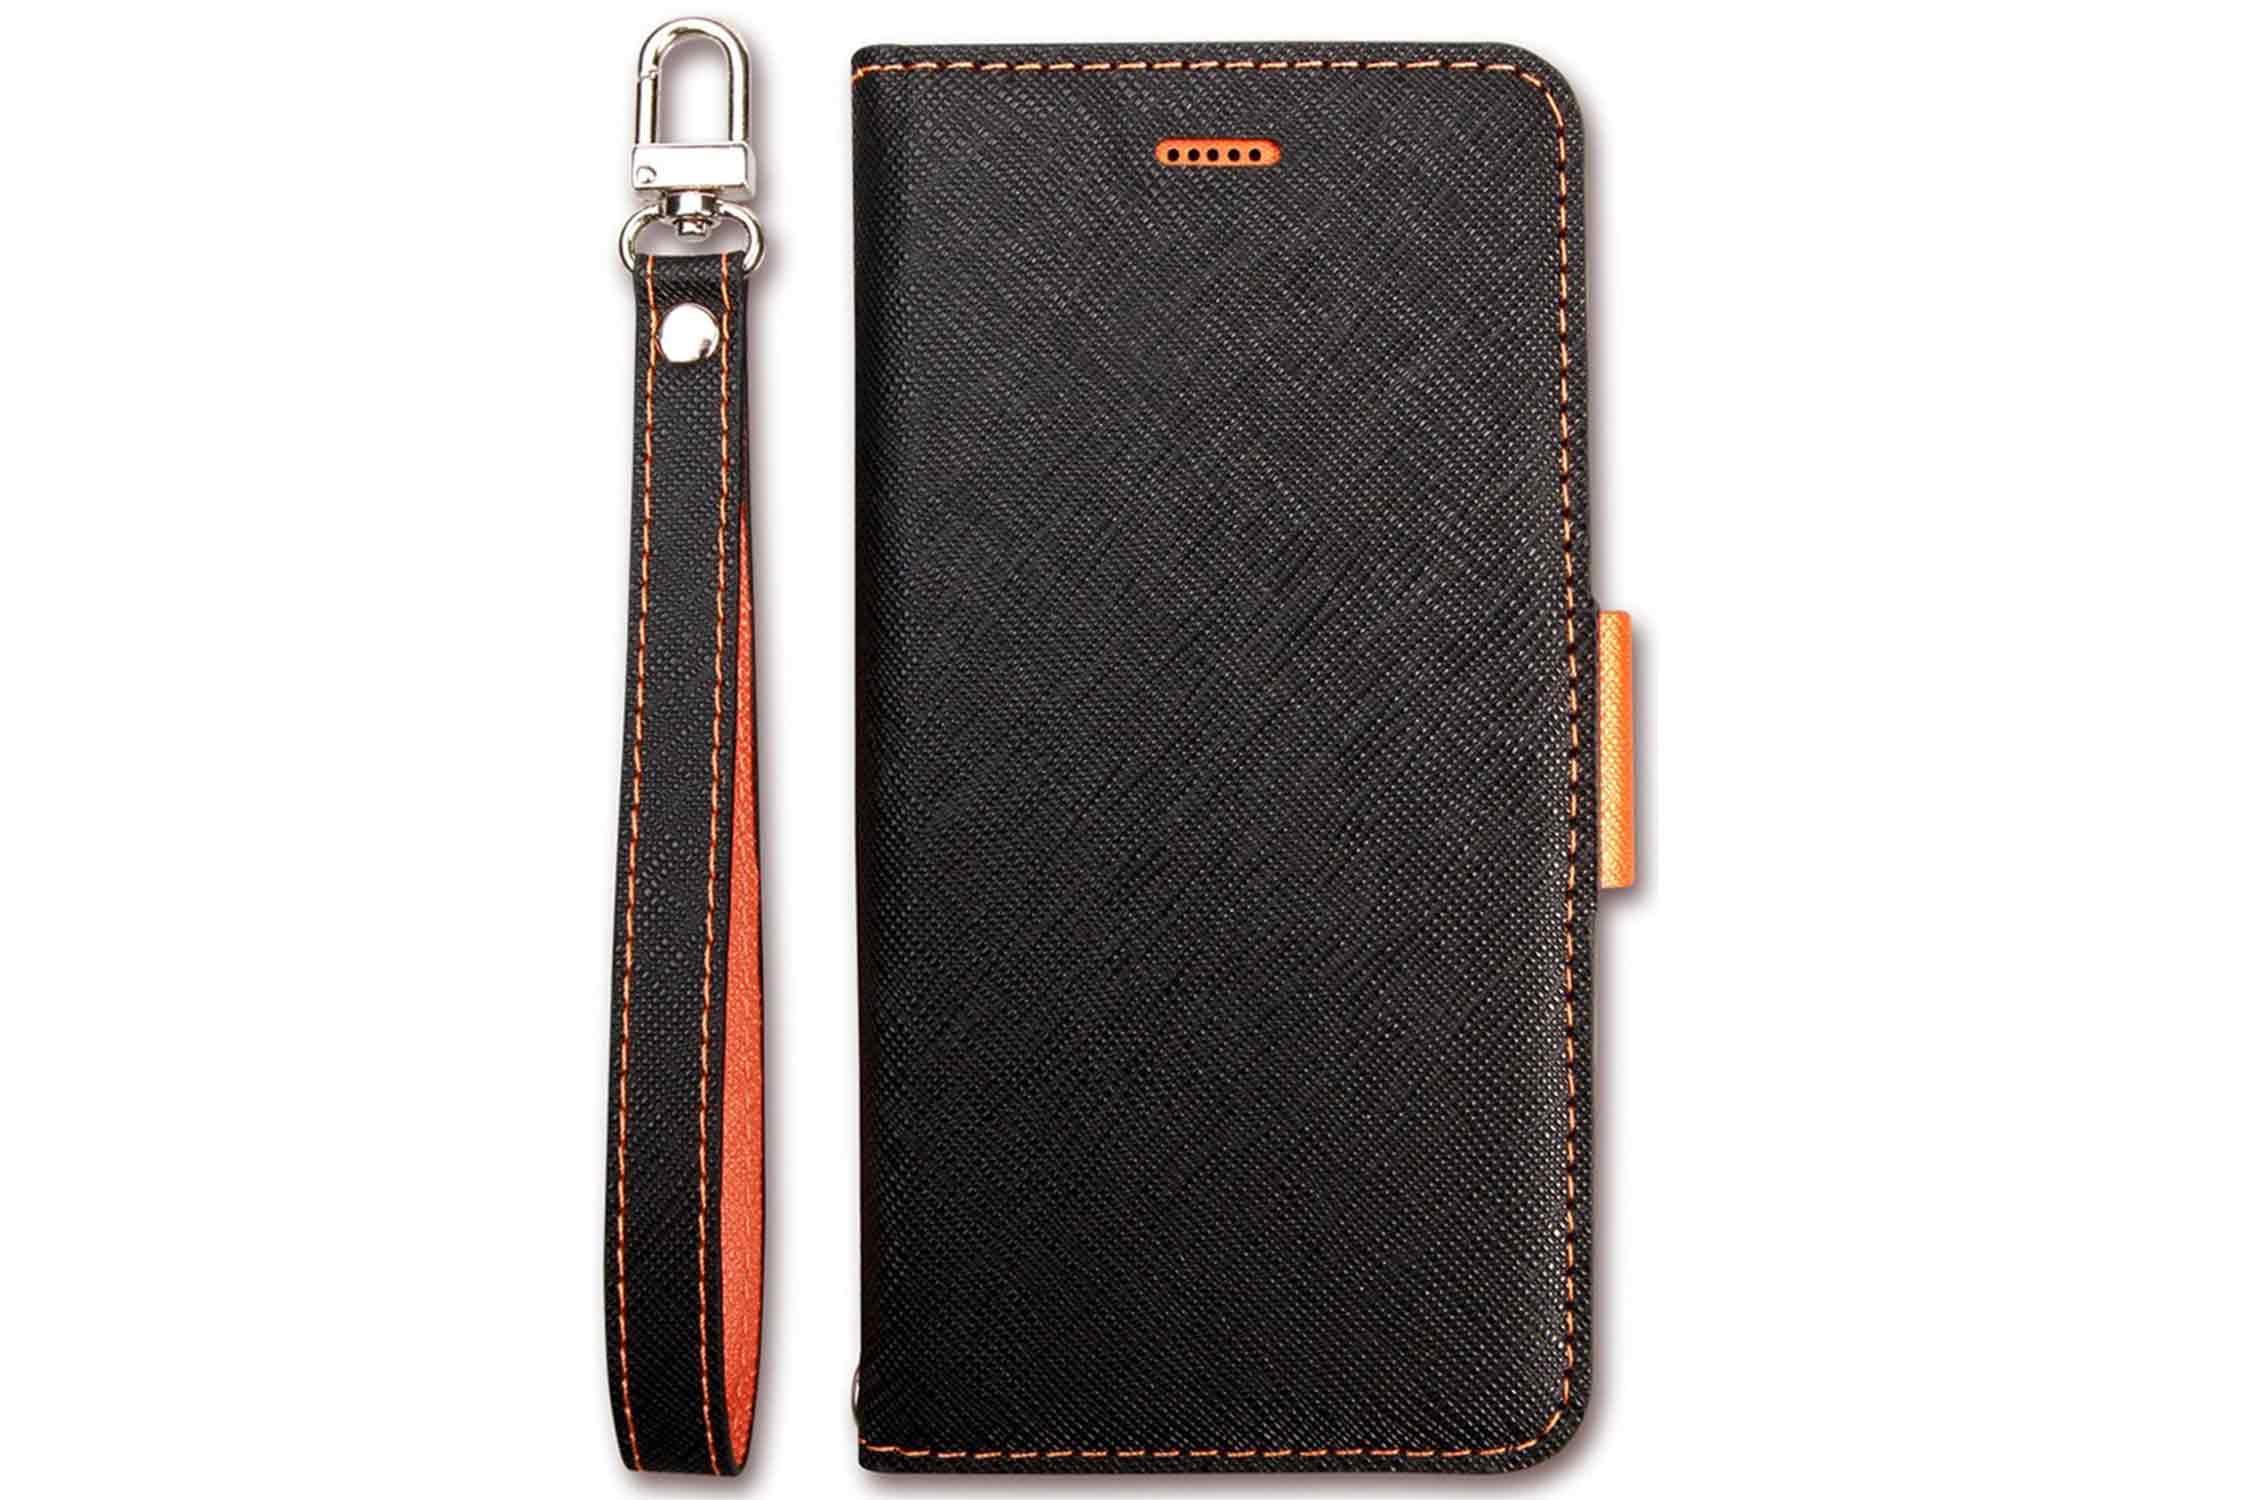 Corallo NUiPhone XS Max 手帳型 ケース